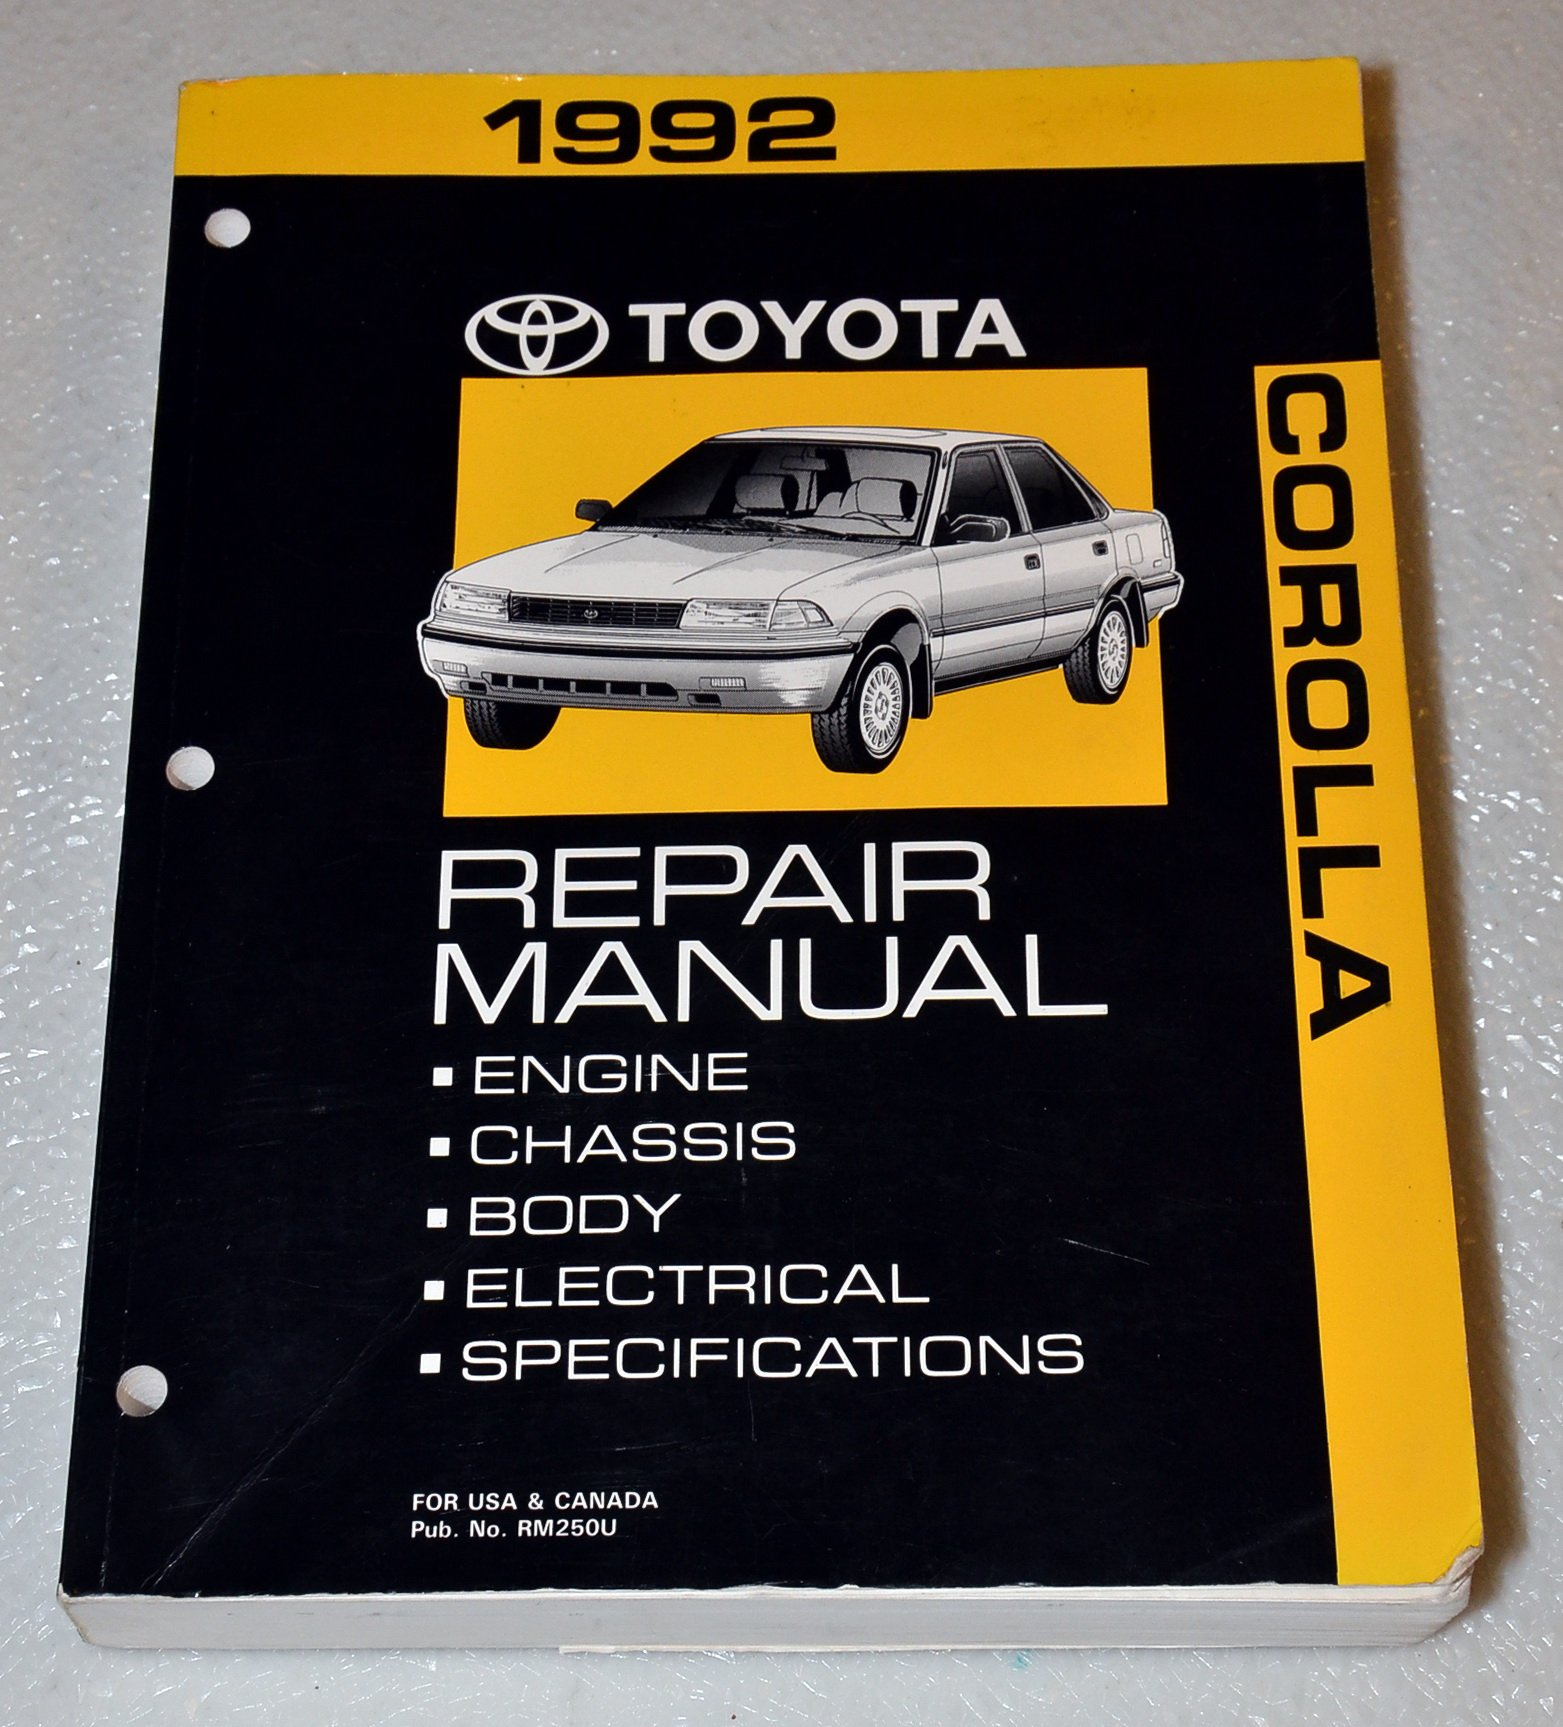 1992 toyota corolla repair manual: toyota motor corporation: 9780191080500:  amazon.com: books  amazon.com